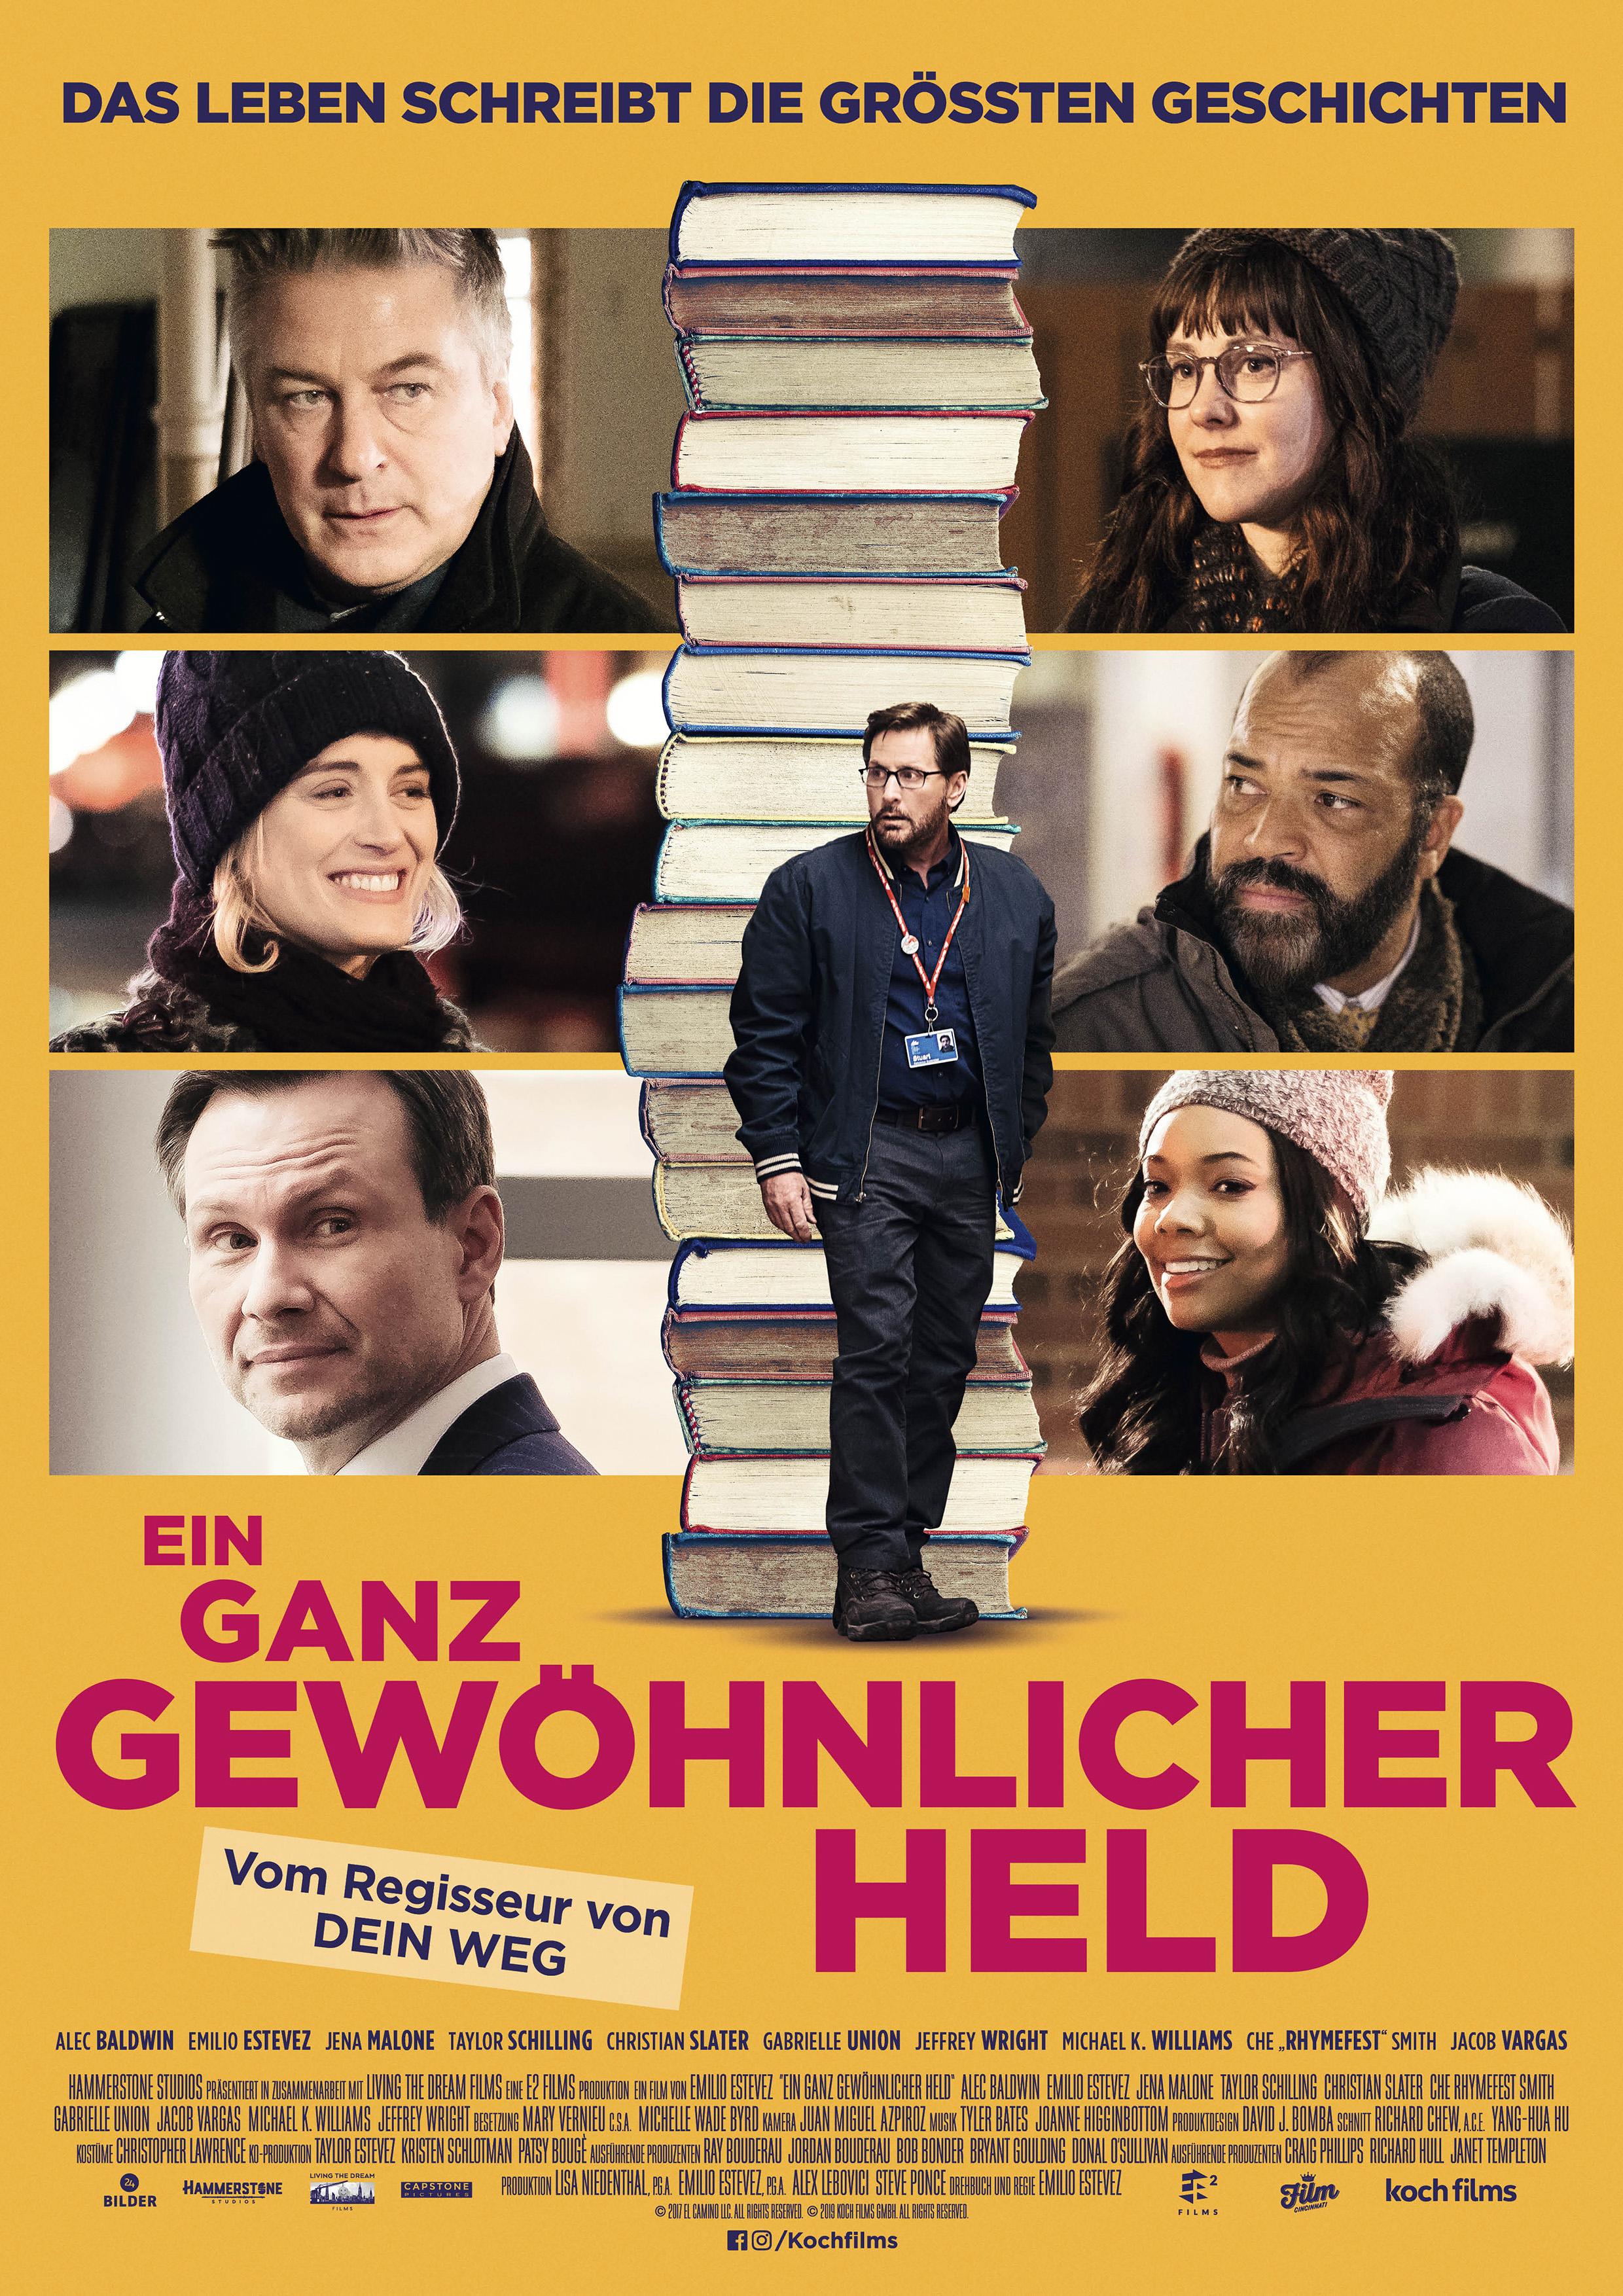 Christian Slater, Alec Baldwin, Emilio Estevez, Gabrielle Union, Jena Malone, Jeffrey Wright, and Taylor Schilling in The Public (2018)